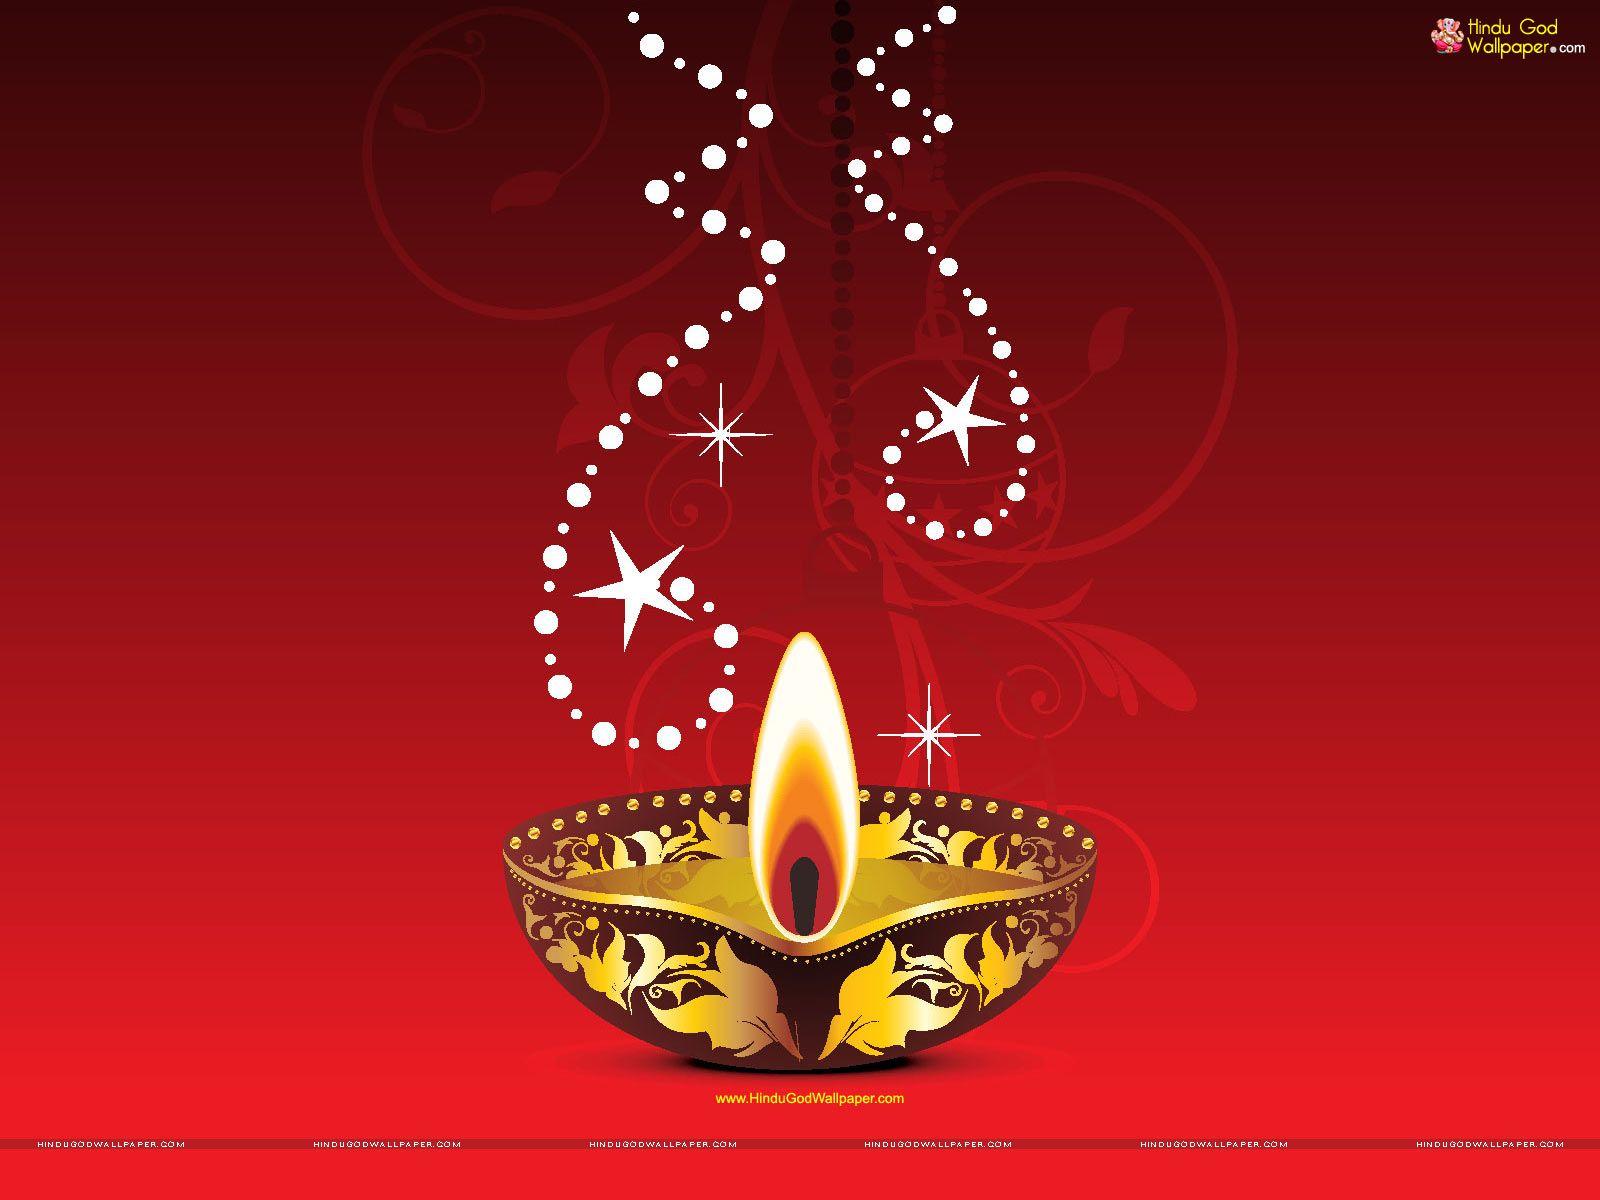 Diwali greeting cards drawing homemade ideas | Stuff to buy ... for diwali single diya wallpaper  70ref